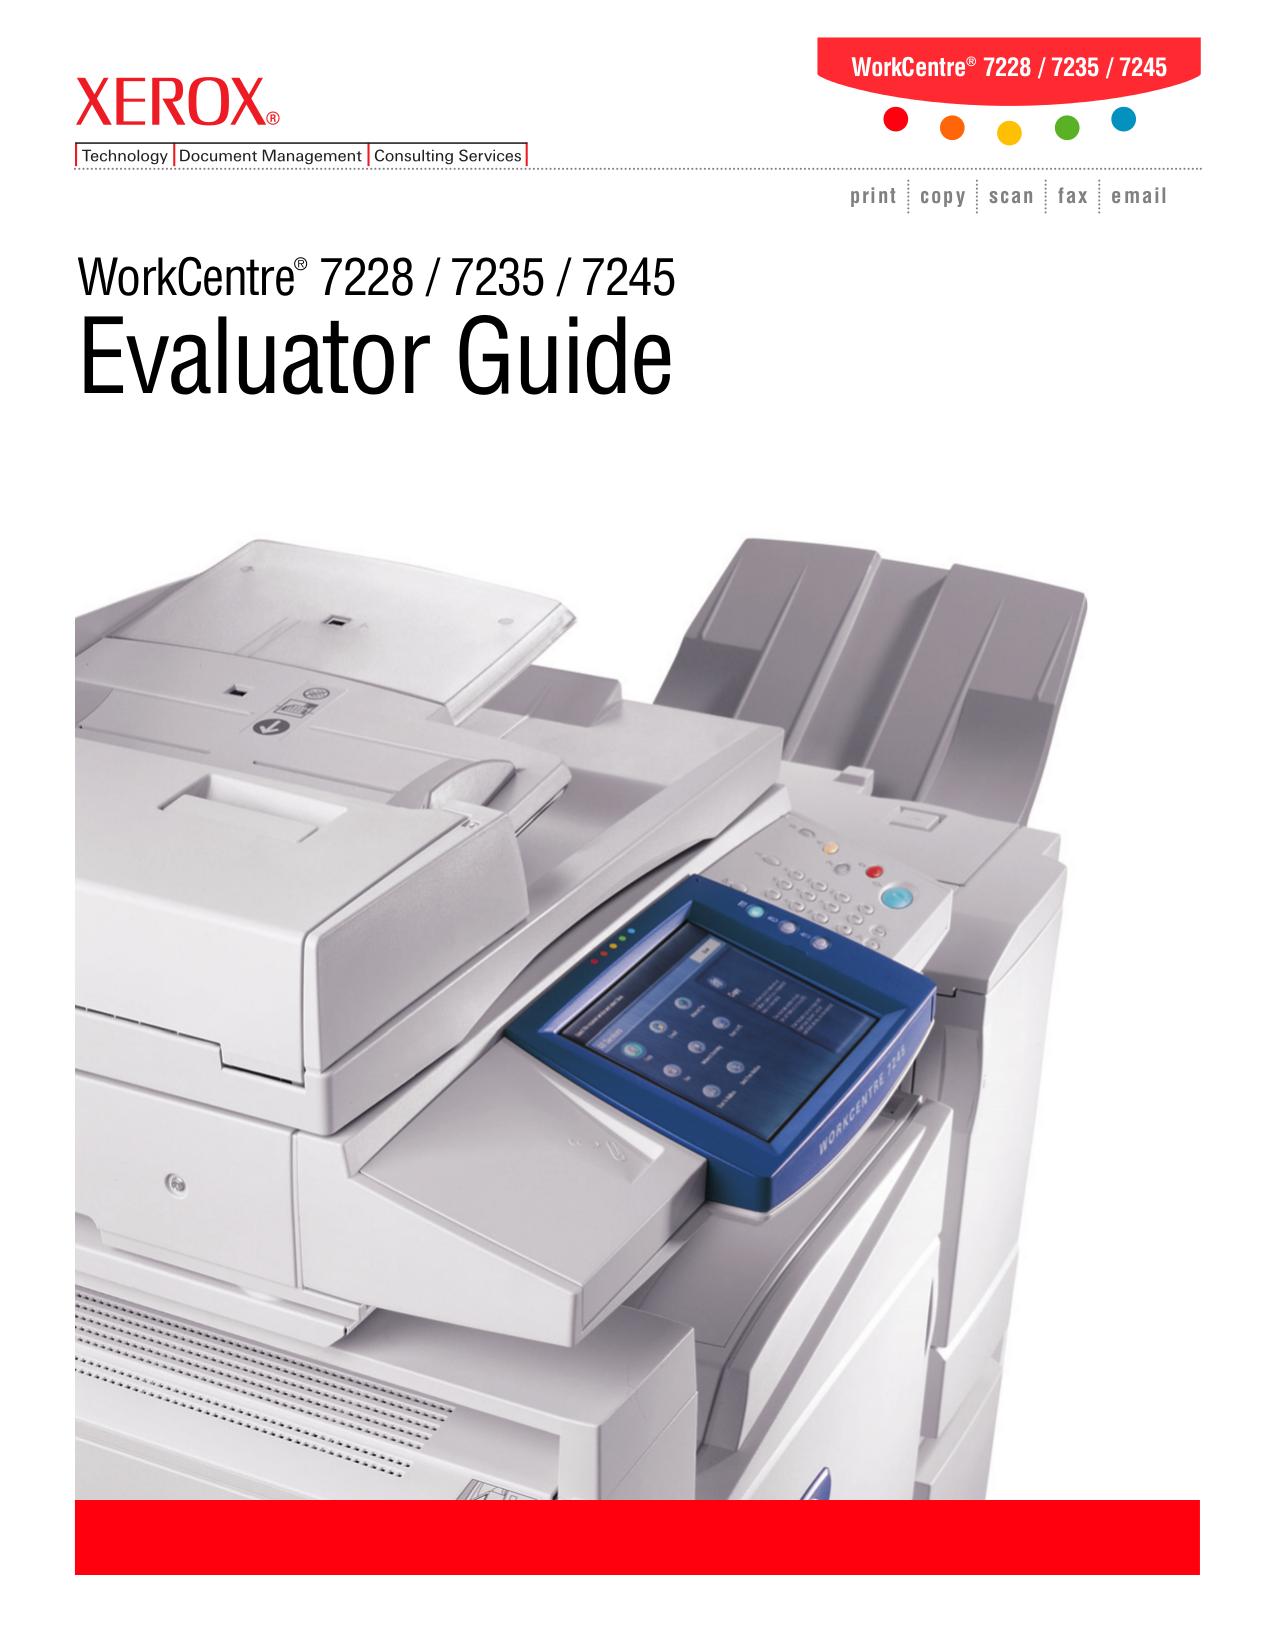 xerox 7345 user guide various owner manual guide u2022 rh justk co xerox 7345 service manual pdf xerox workcentre 7345 service manual pdf